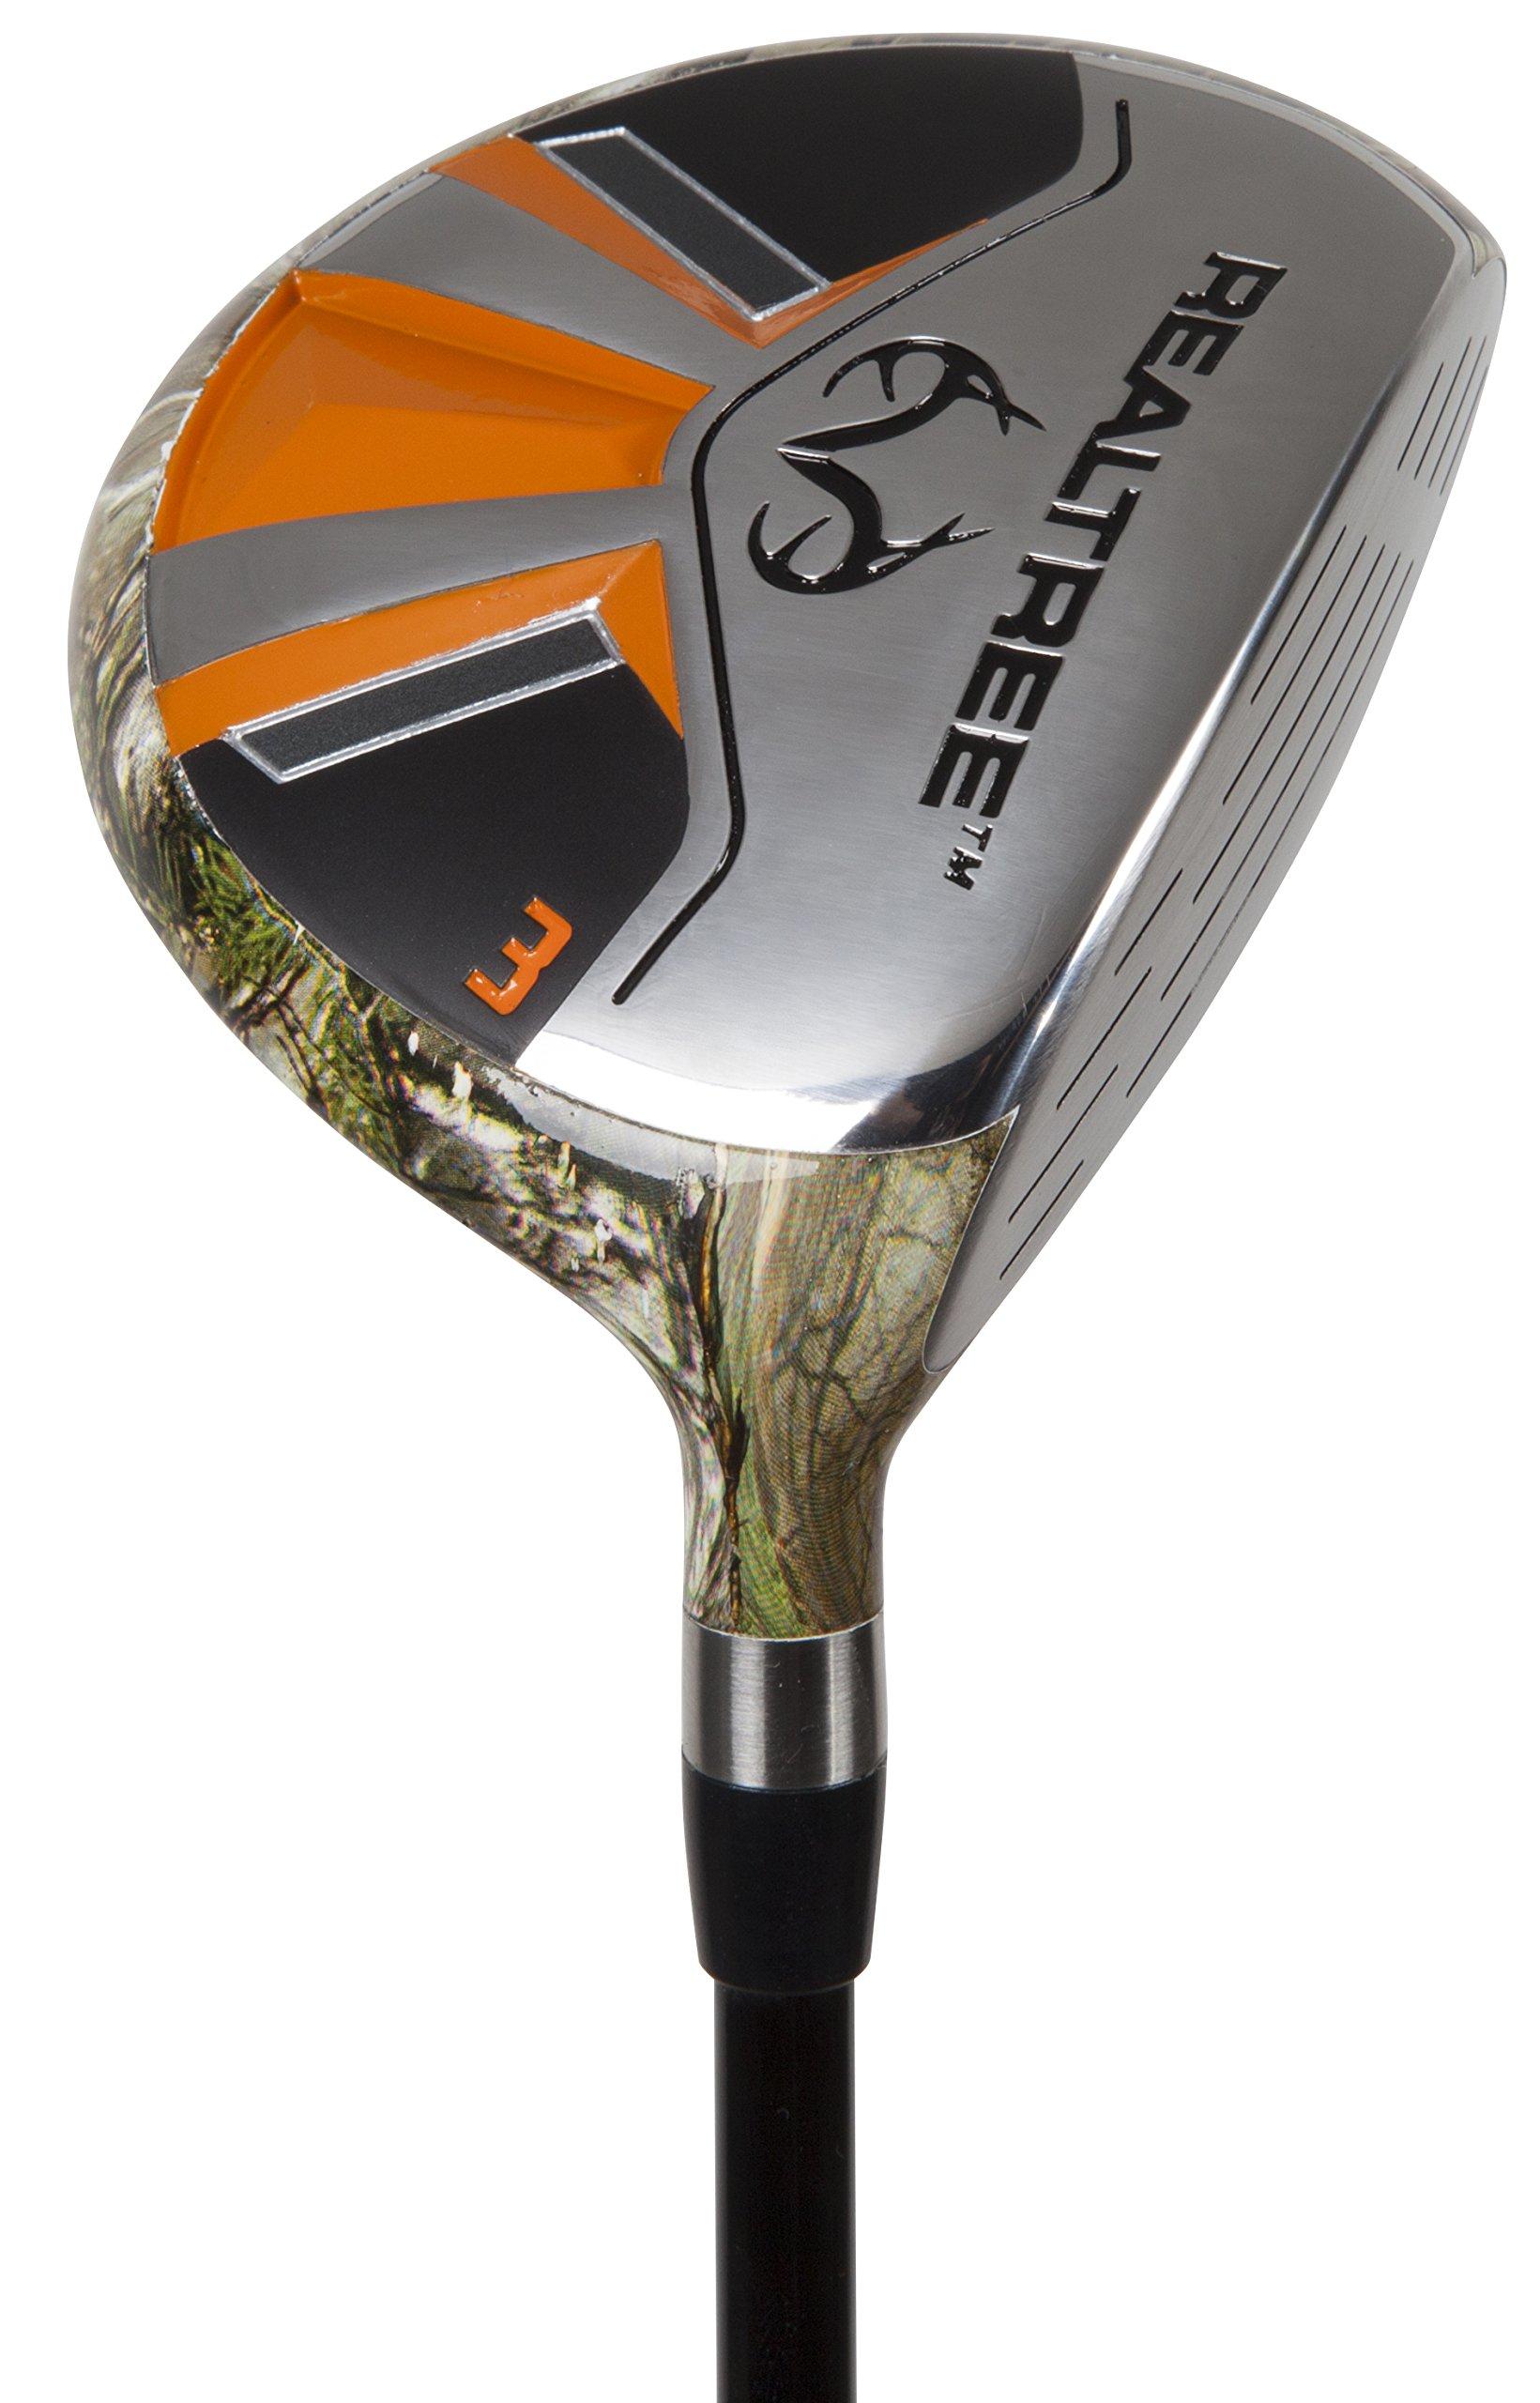 Pinemeadow Golf Men's Realtree Xtra Hybrid Club, Graphite, 15-Degree, 3, Regular, Right Hand